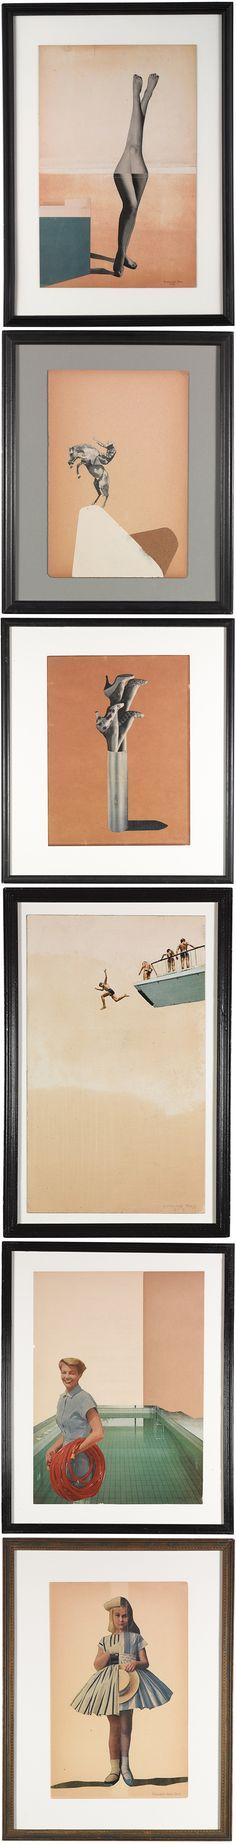 The Jealous Curator /// curated contemporary art /// kirkland bray